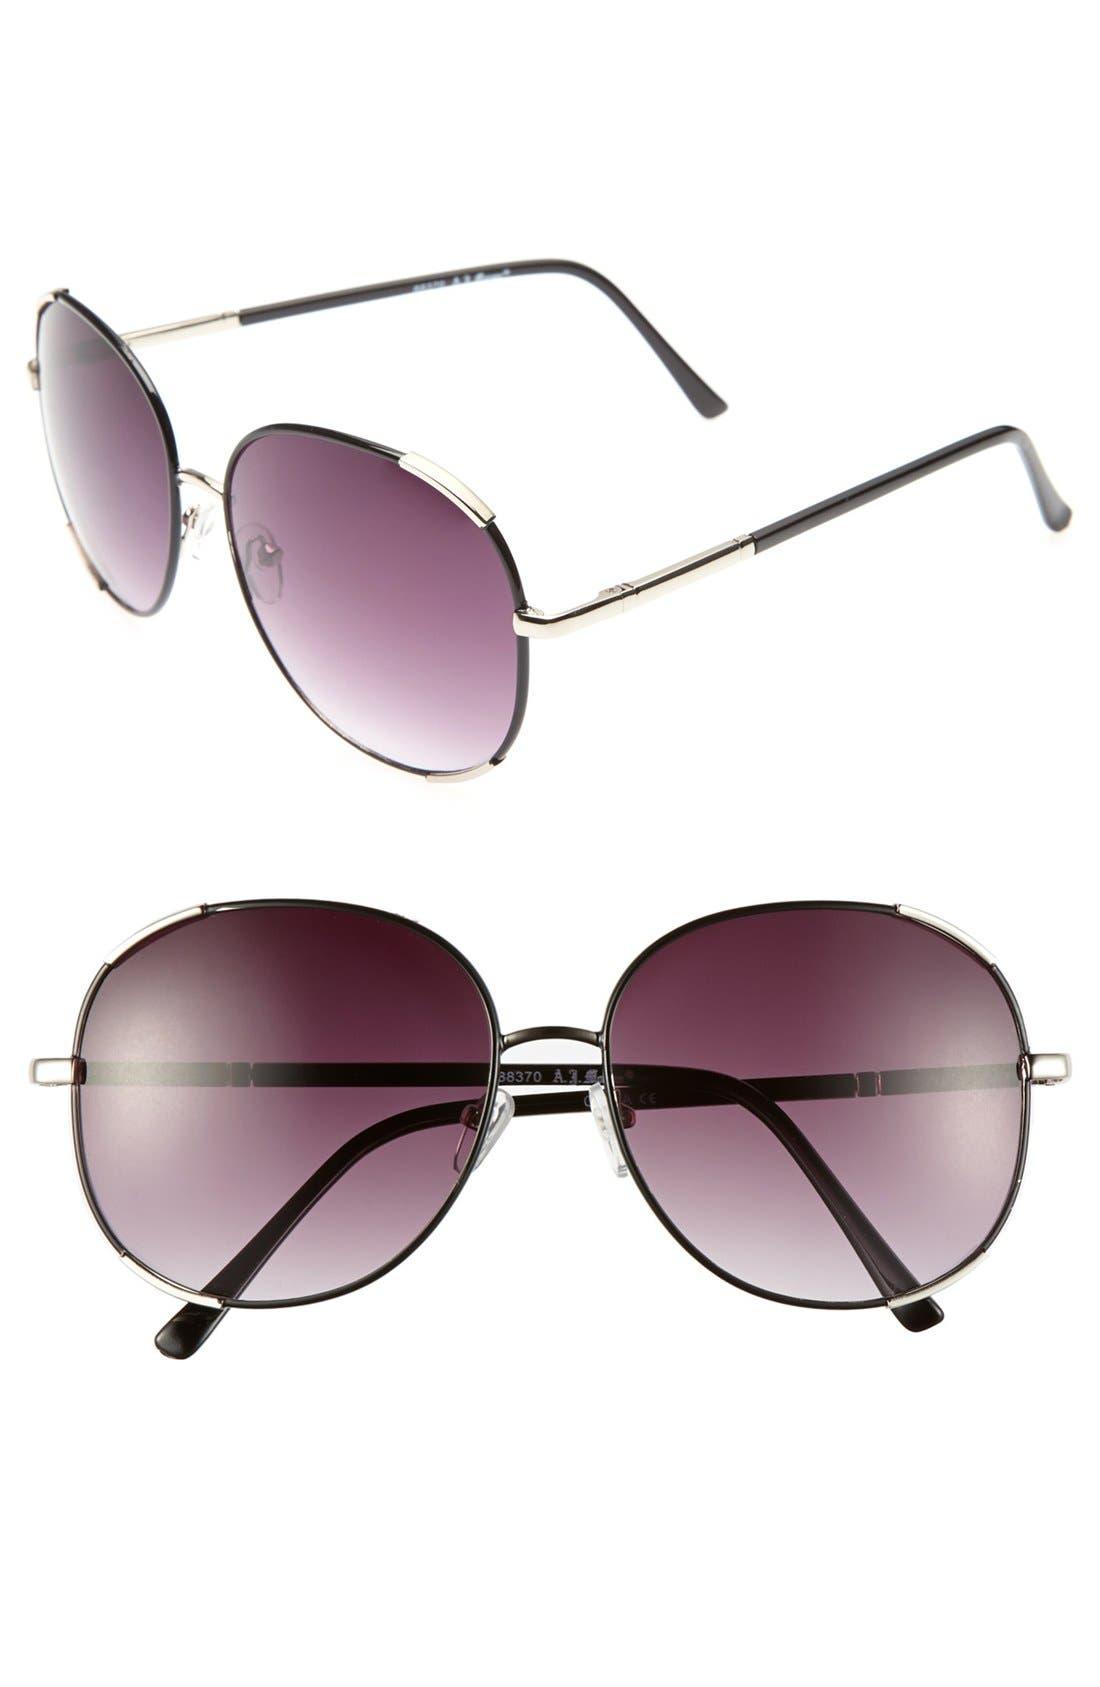 Main Image - A.J. Morgan 'Marnie' 58mm Sunglasses